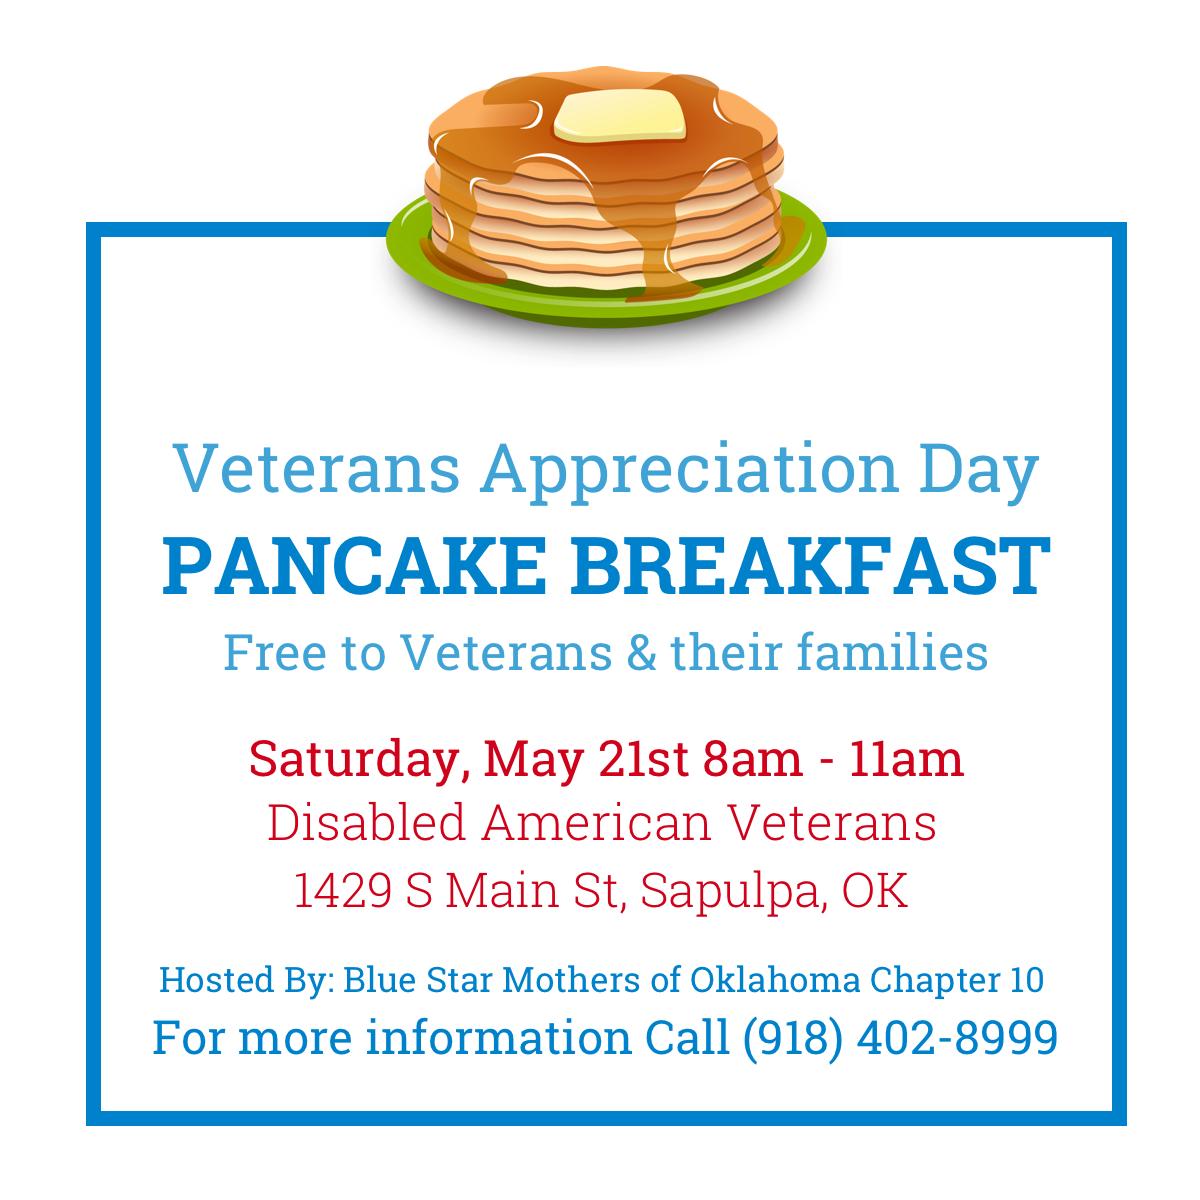 veterans-appreciation-pancake-breakfast